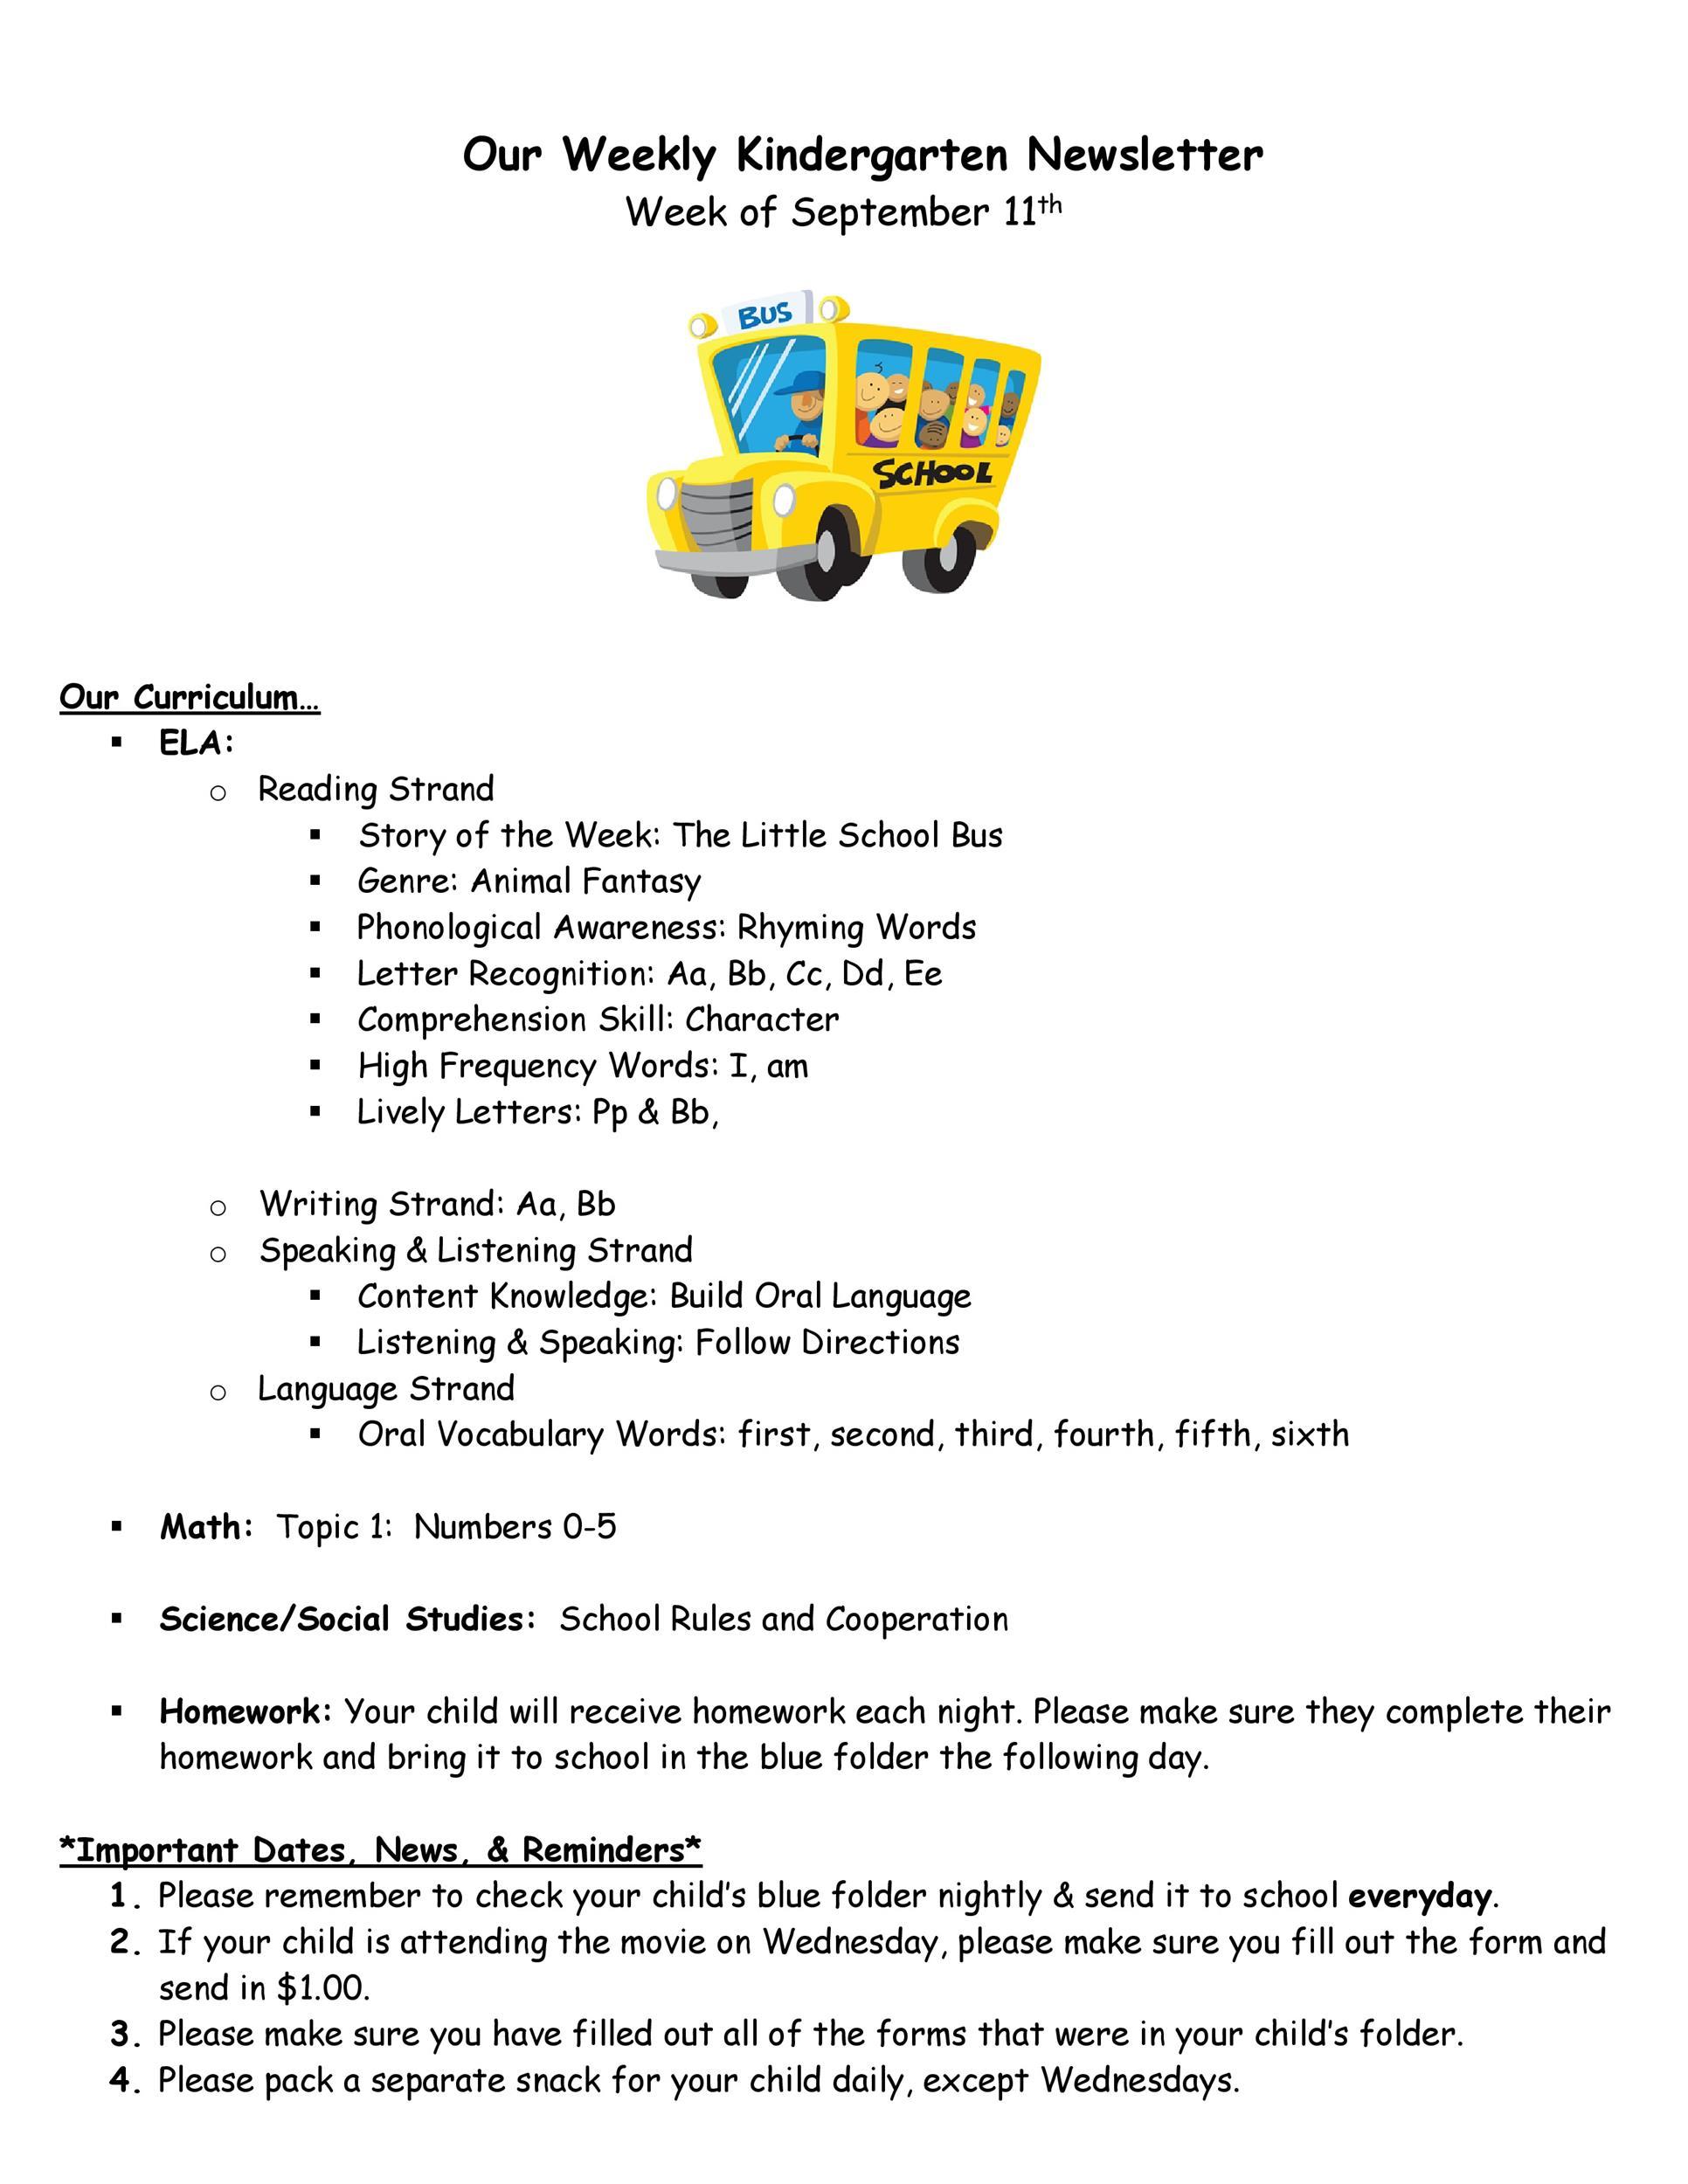 Free preschool newsletter template 46